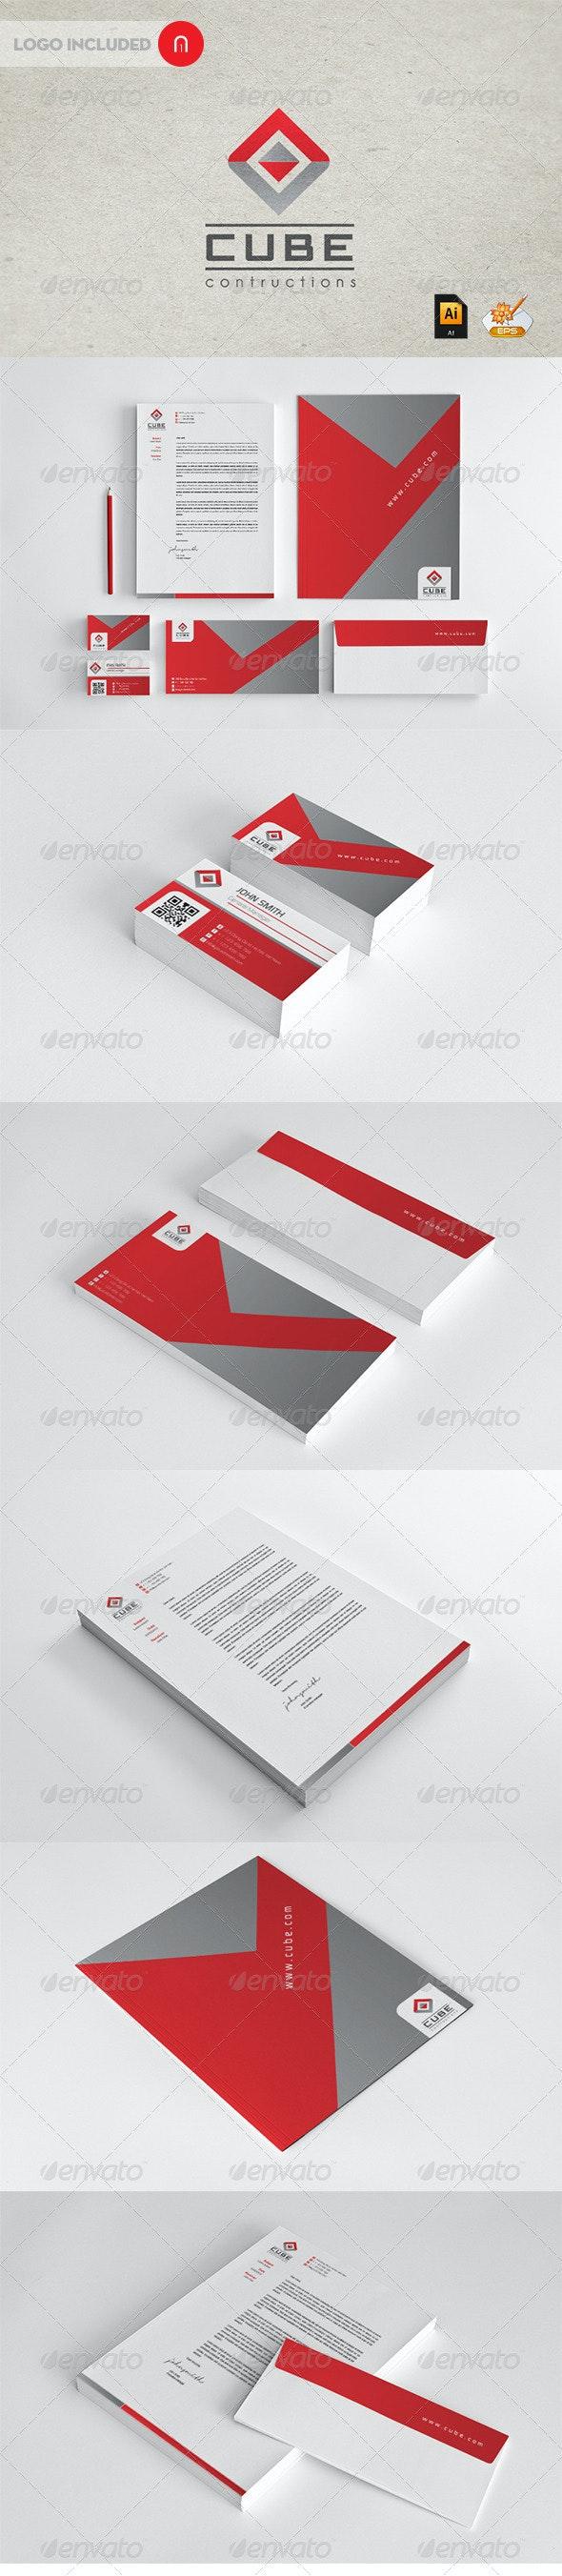 Stationary & Identity - Cube contructions - Stationery Print Templates